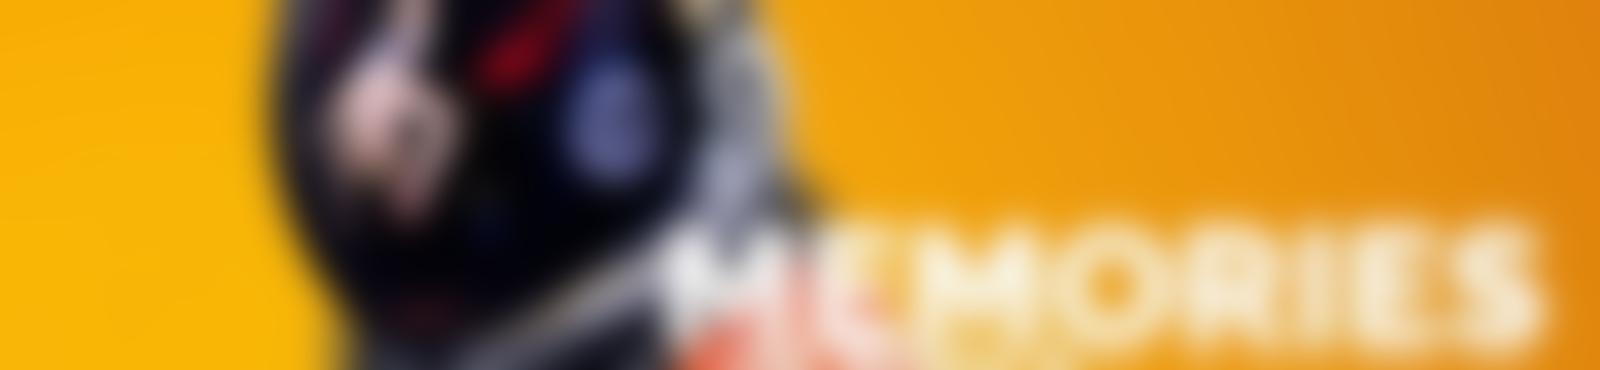 Blurred 7232b716 fc50 4290 ac9d d631c00f3e64